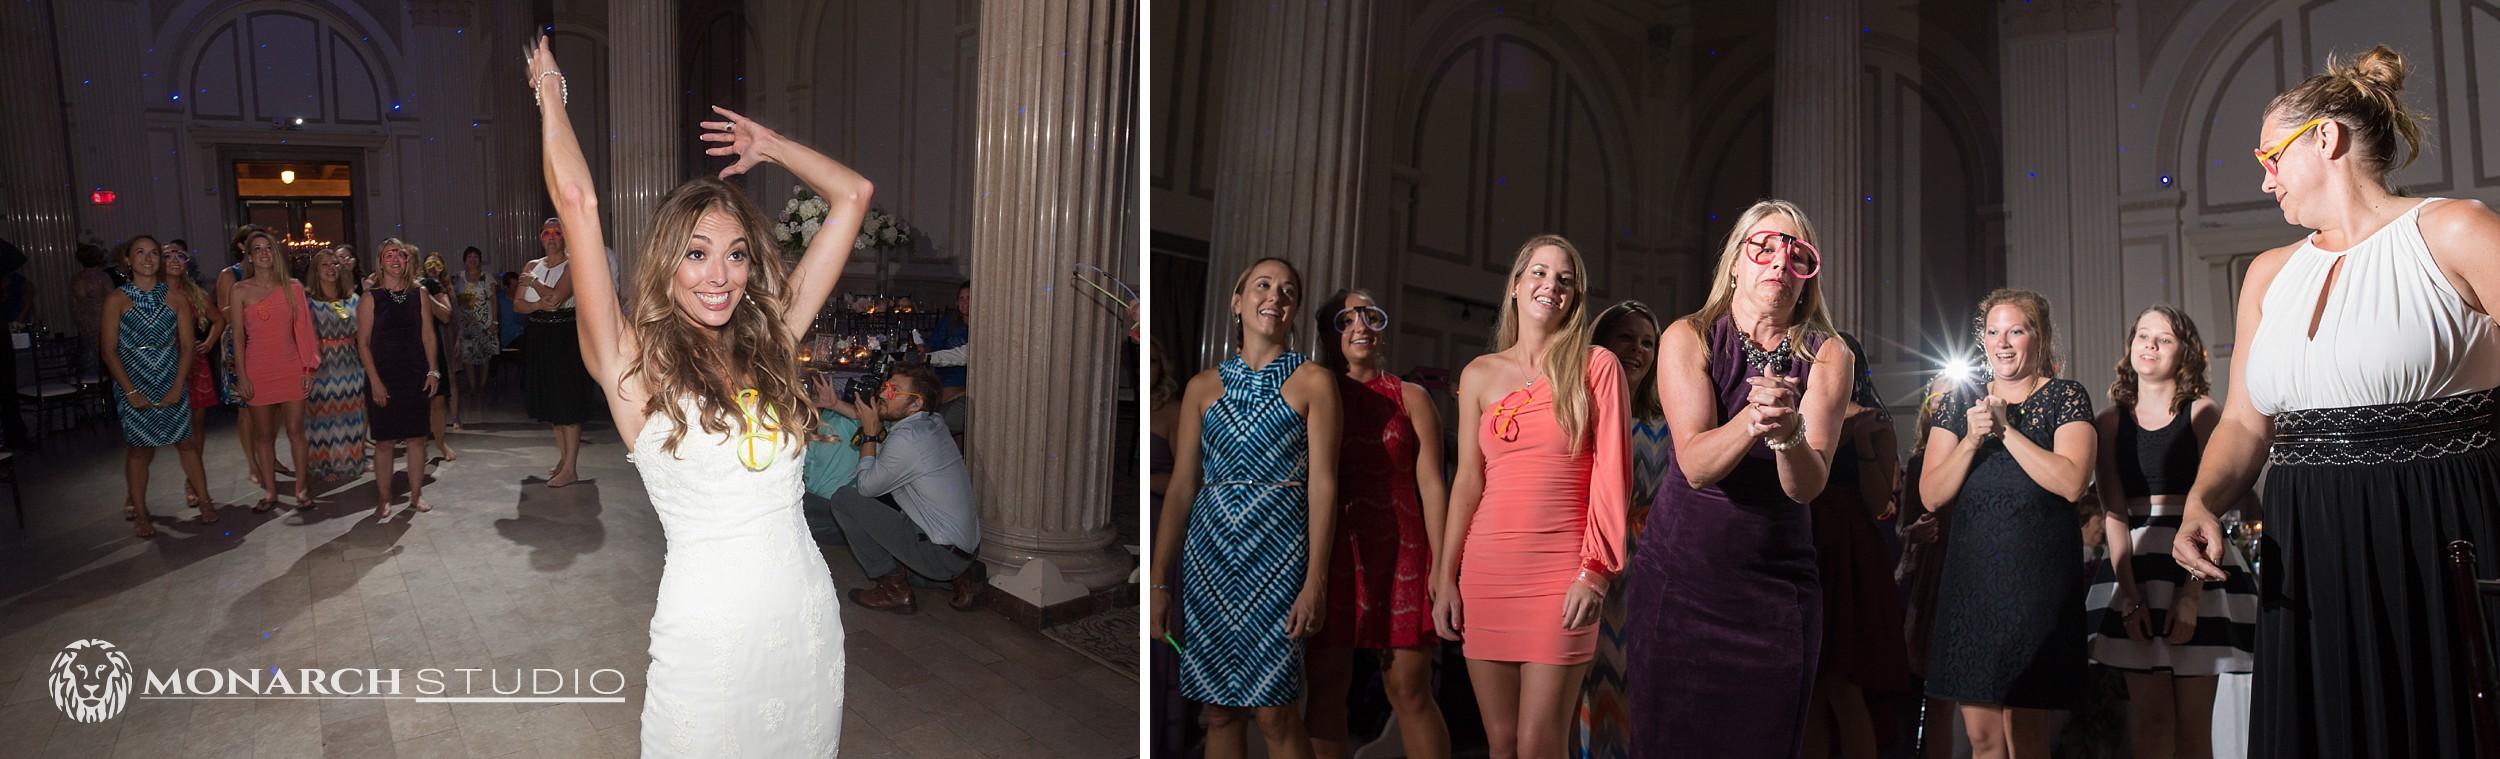 St-Augustine-Wedding-Photographer_0144.jpg